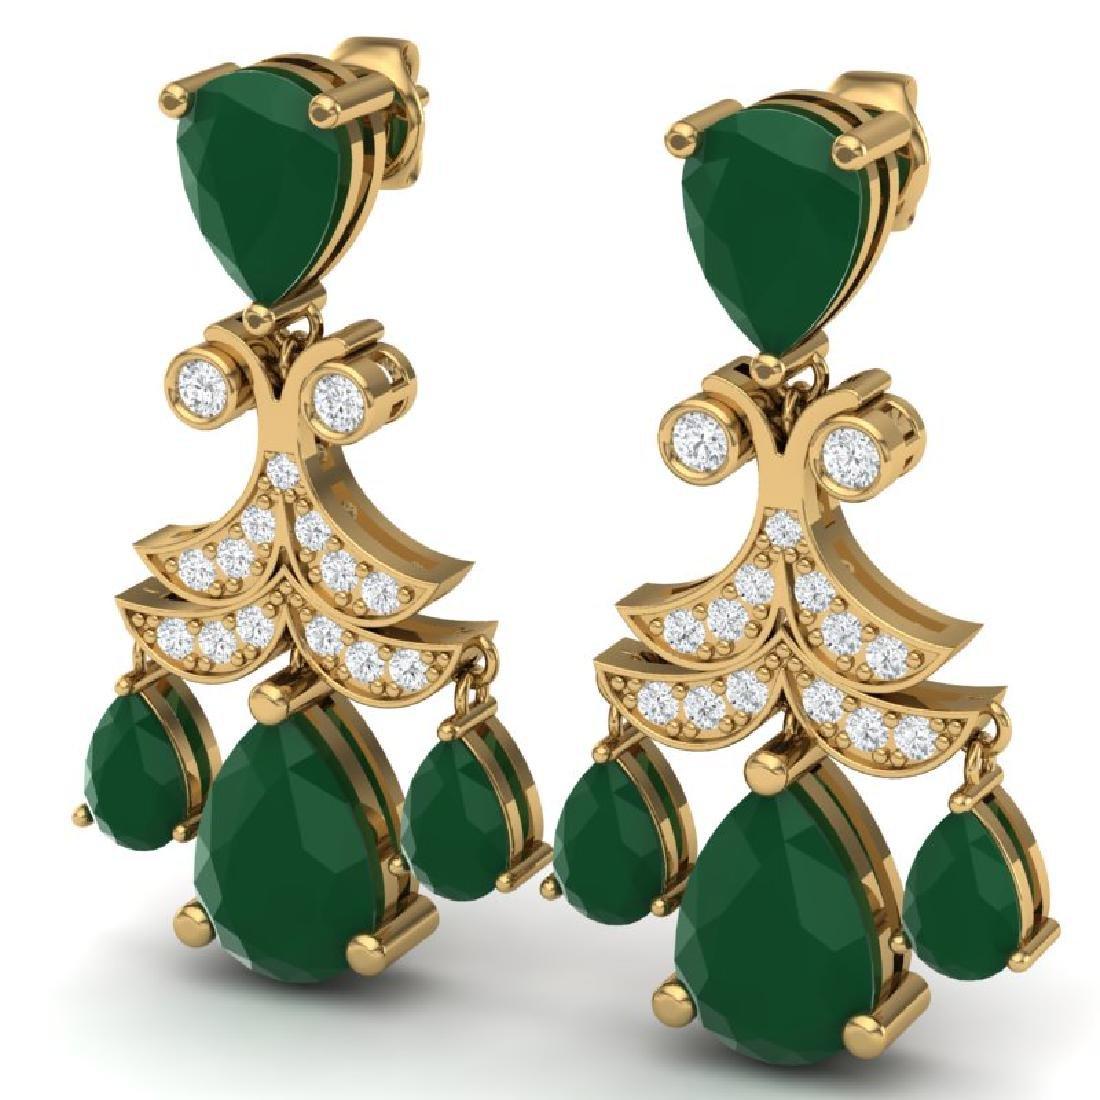 11.97 CTW Royalty Emerald & VS Diamond Earrings 18K - 2